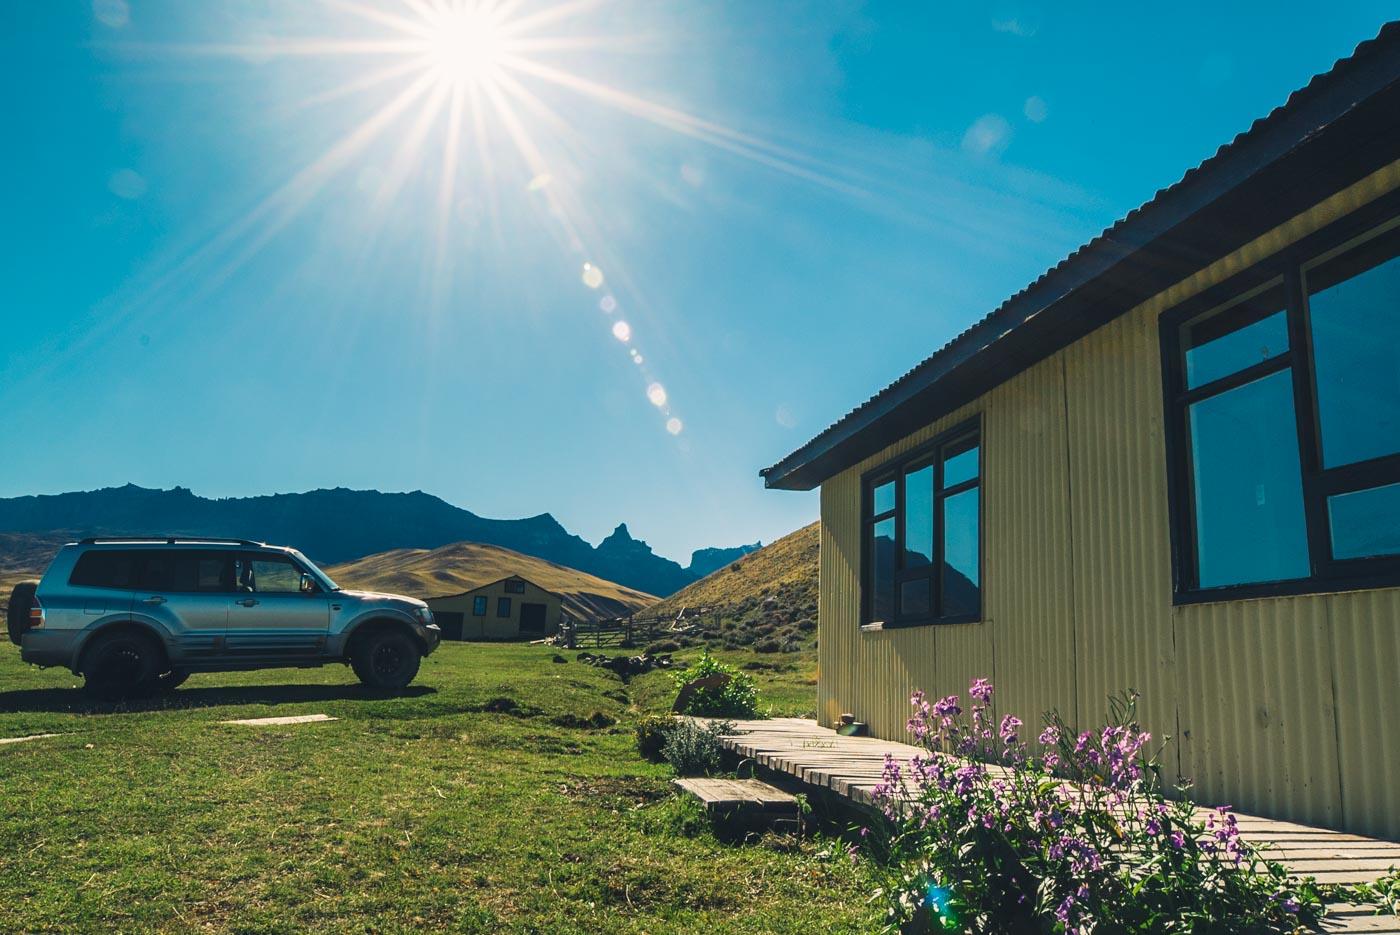 Baguales Estancia. Puerto Natales. Patagonia, Chile